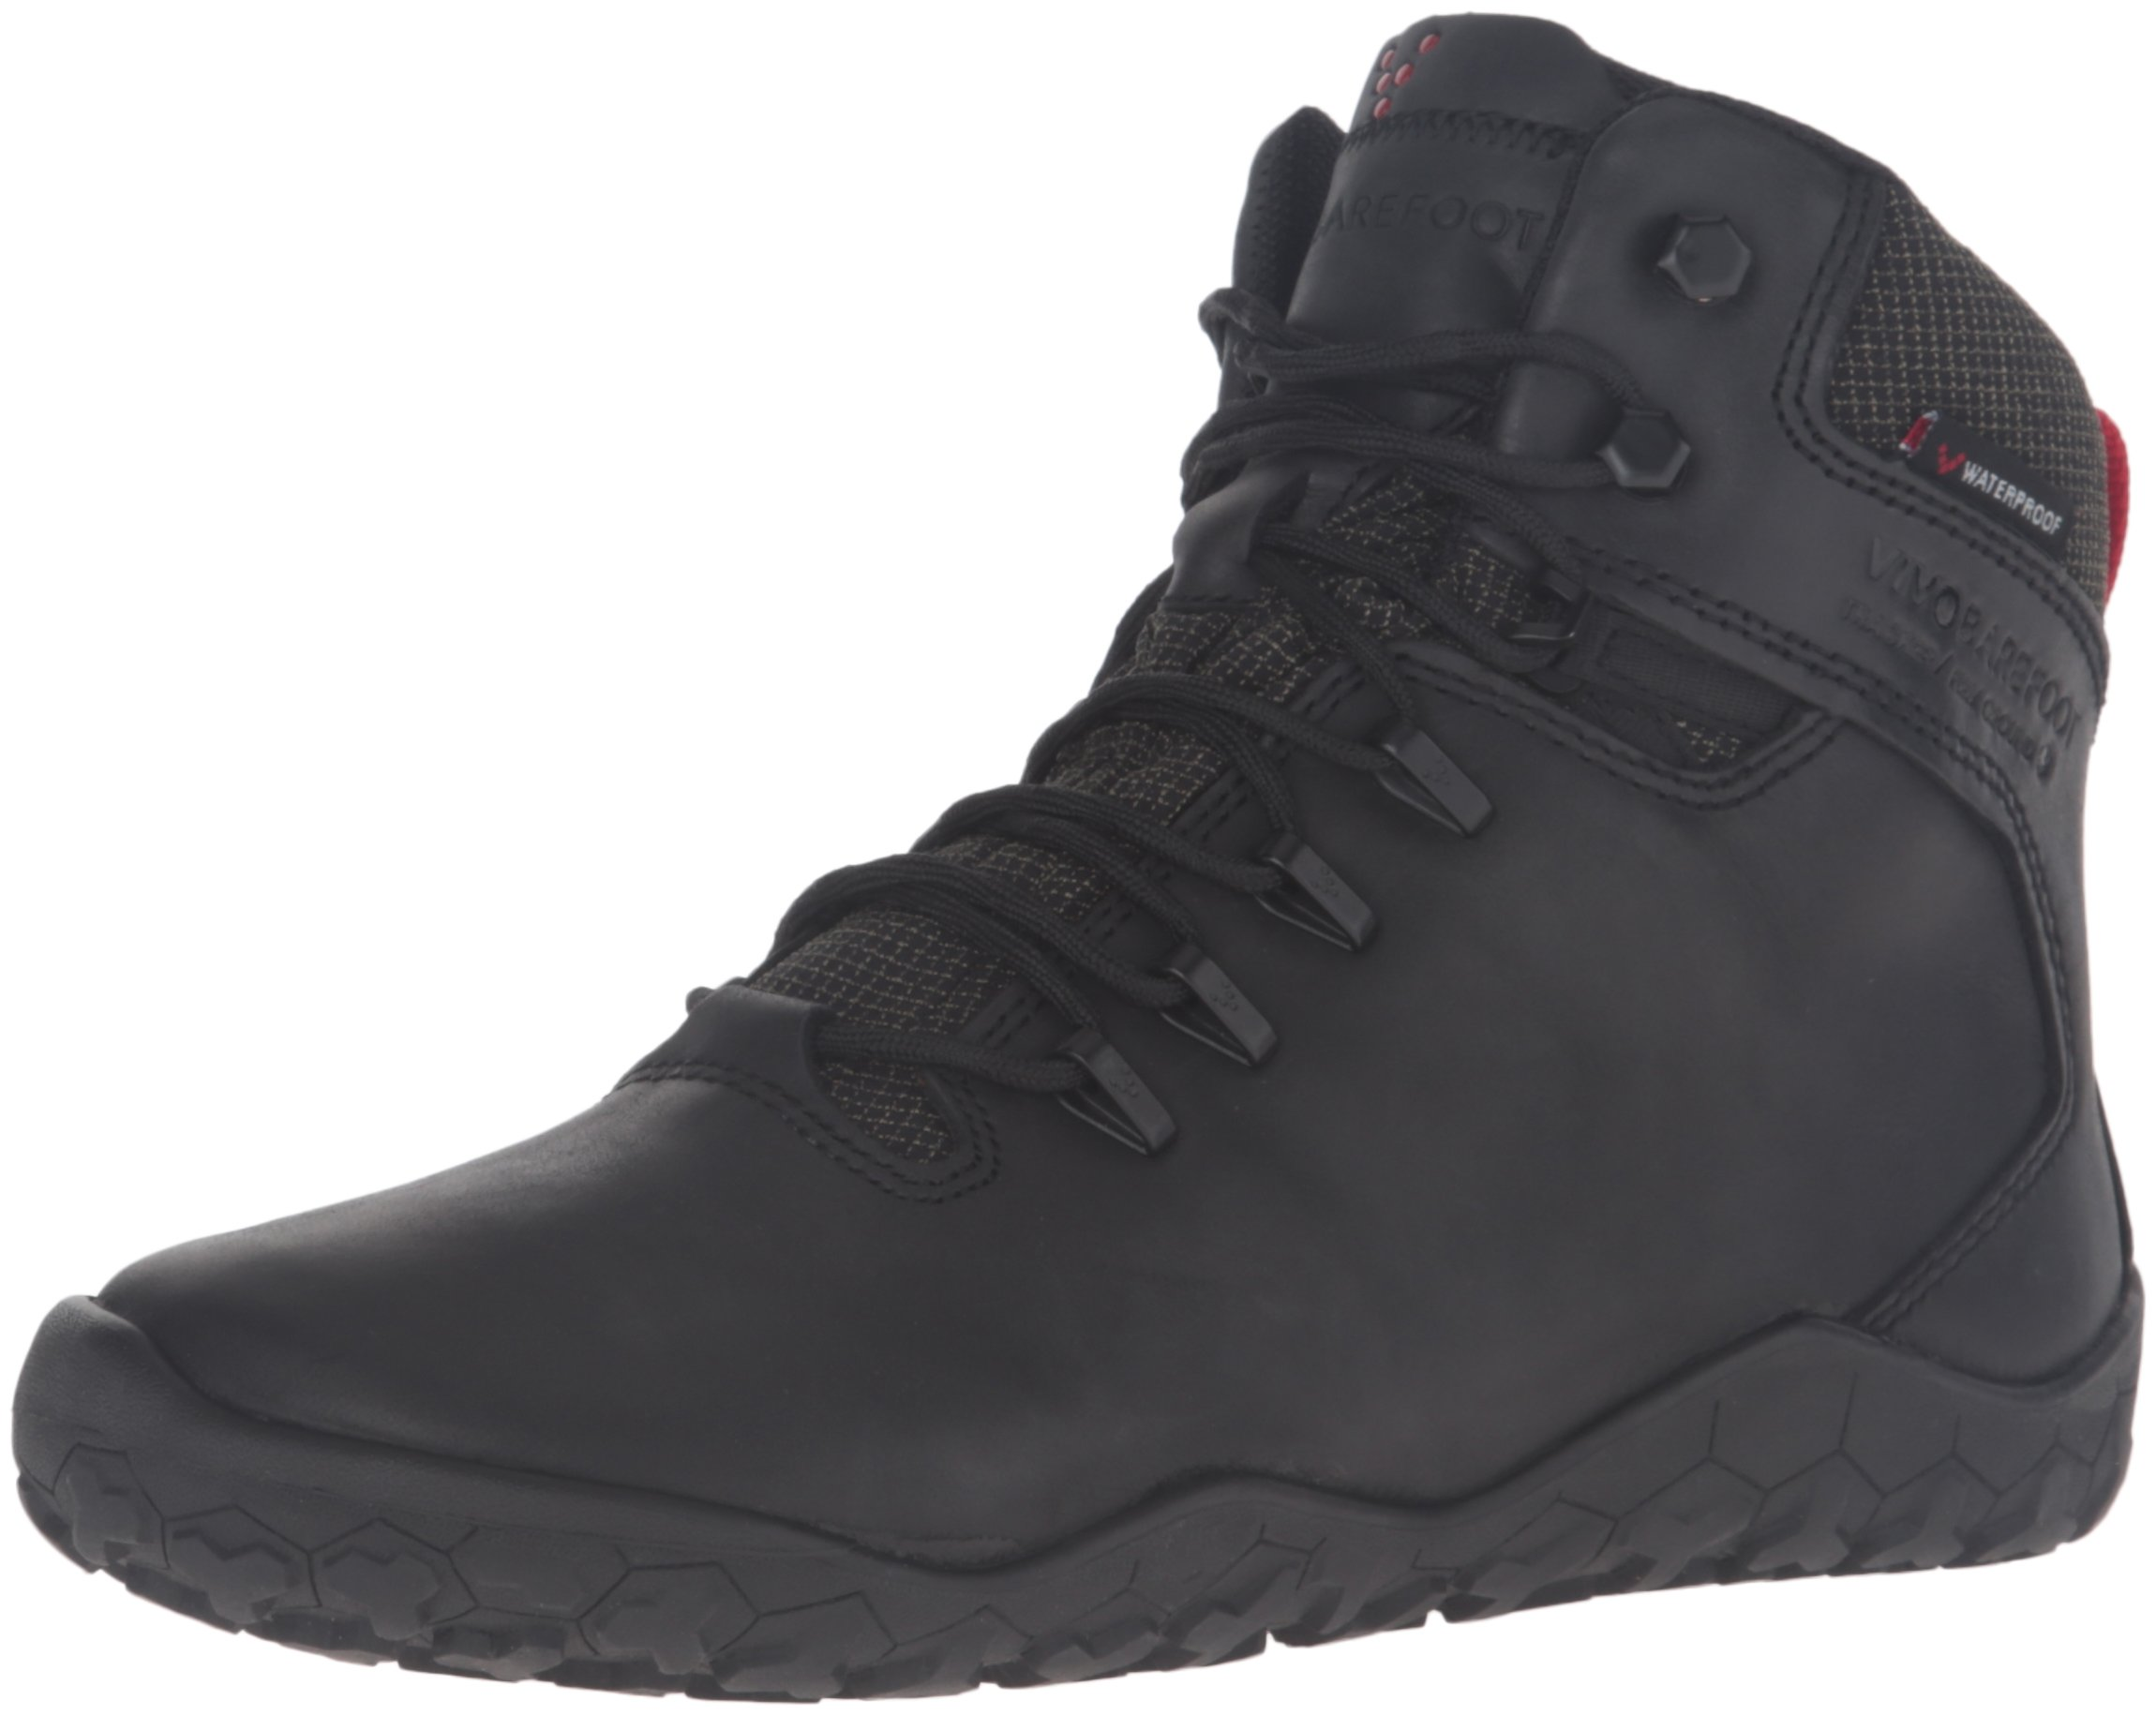 Vivobarefoot Women's Tracker FG L Leather Walking Shoe, Black, 38 EU (7.5 B(M) US Women) by Vivobarefoot